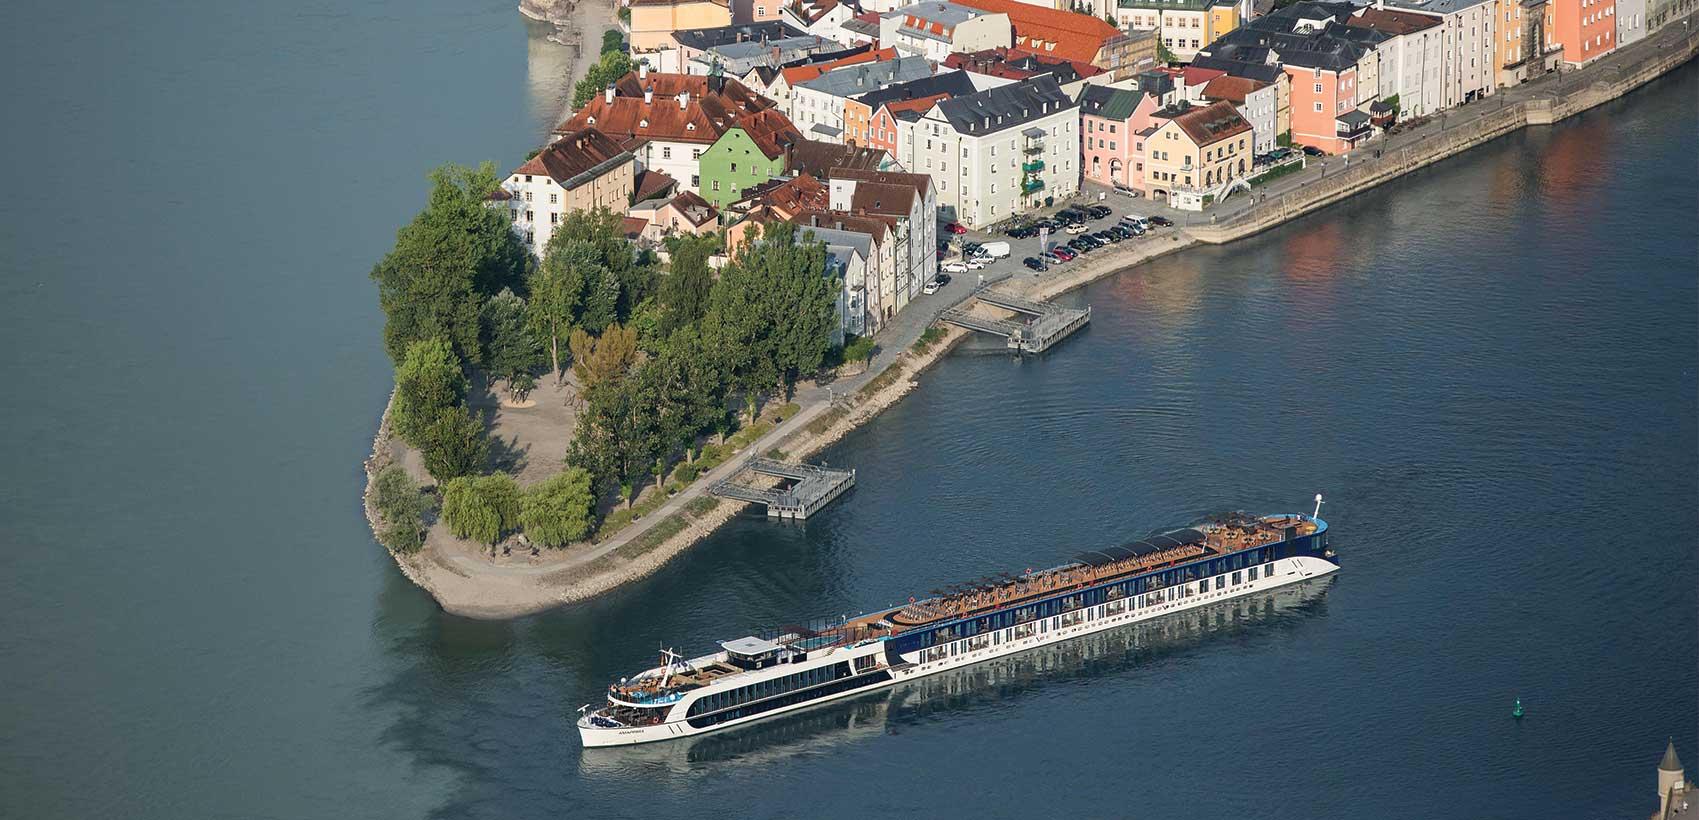 AmaWaterways Active River Cruise Savings 4